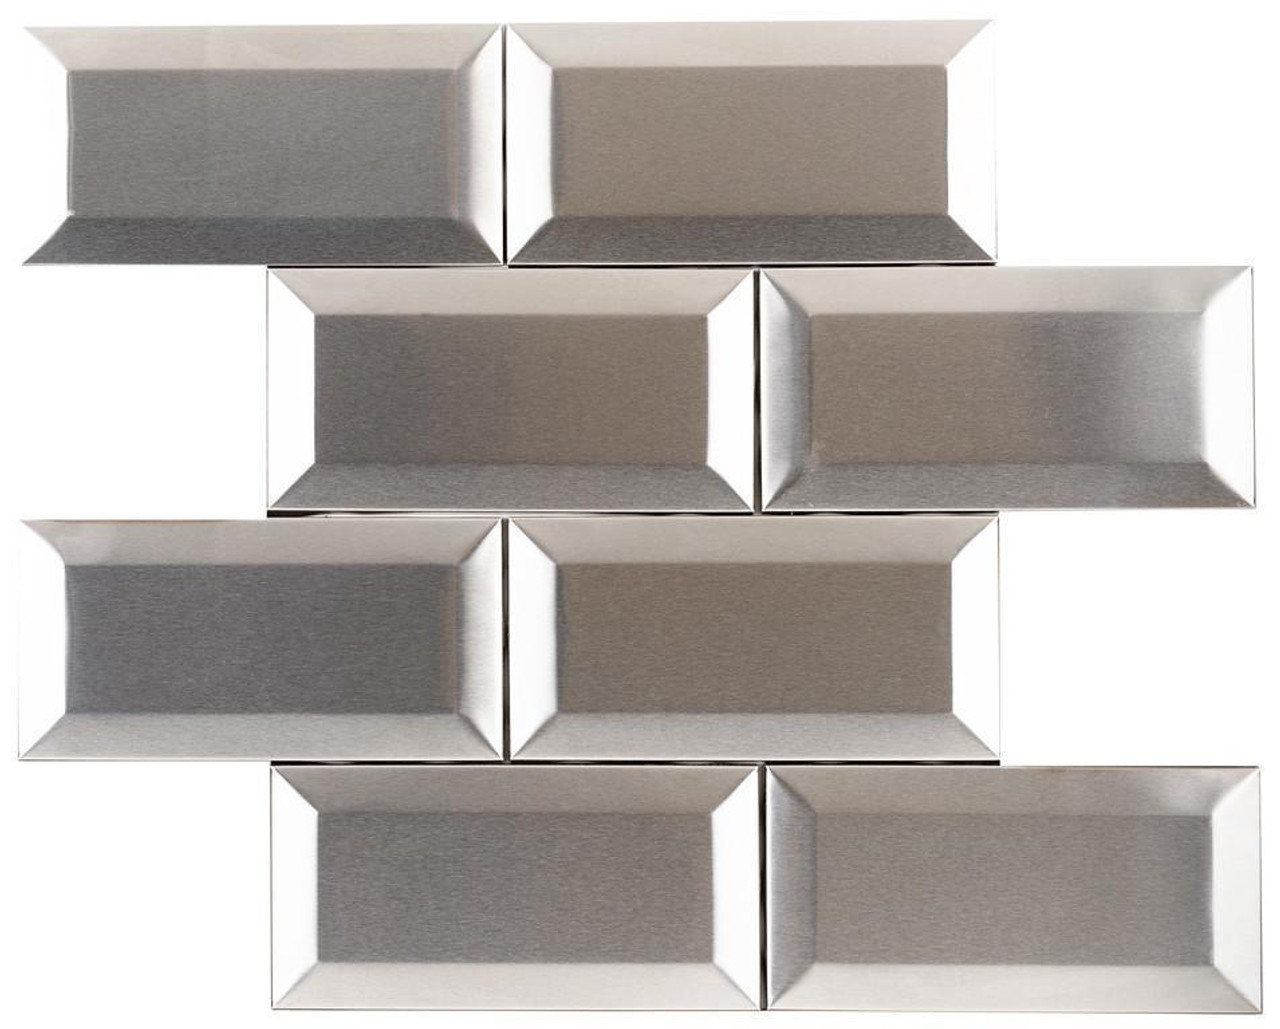 UBC Stainless Steel Tile Backsplash 3 x 6 Bevel Subway Tile